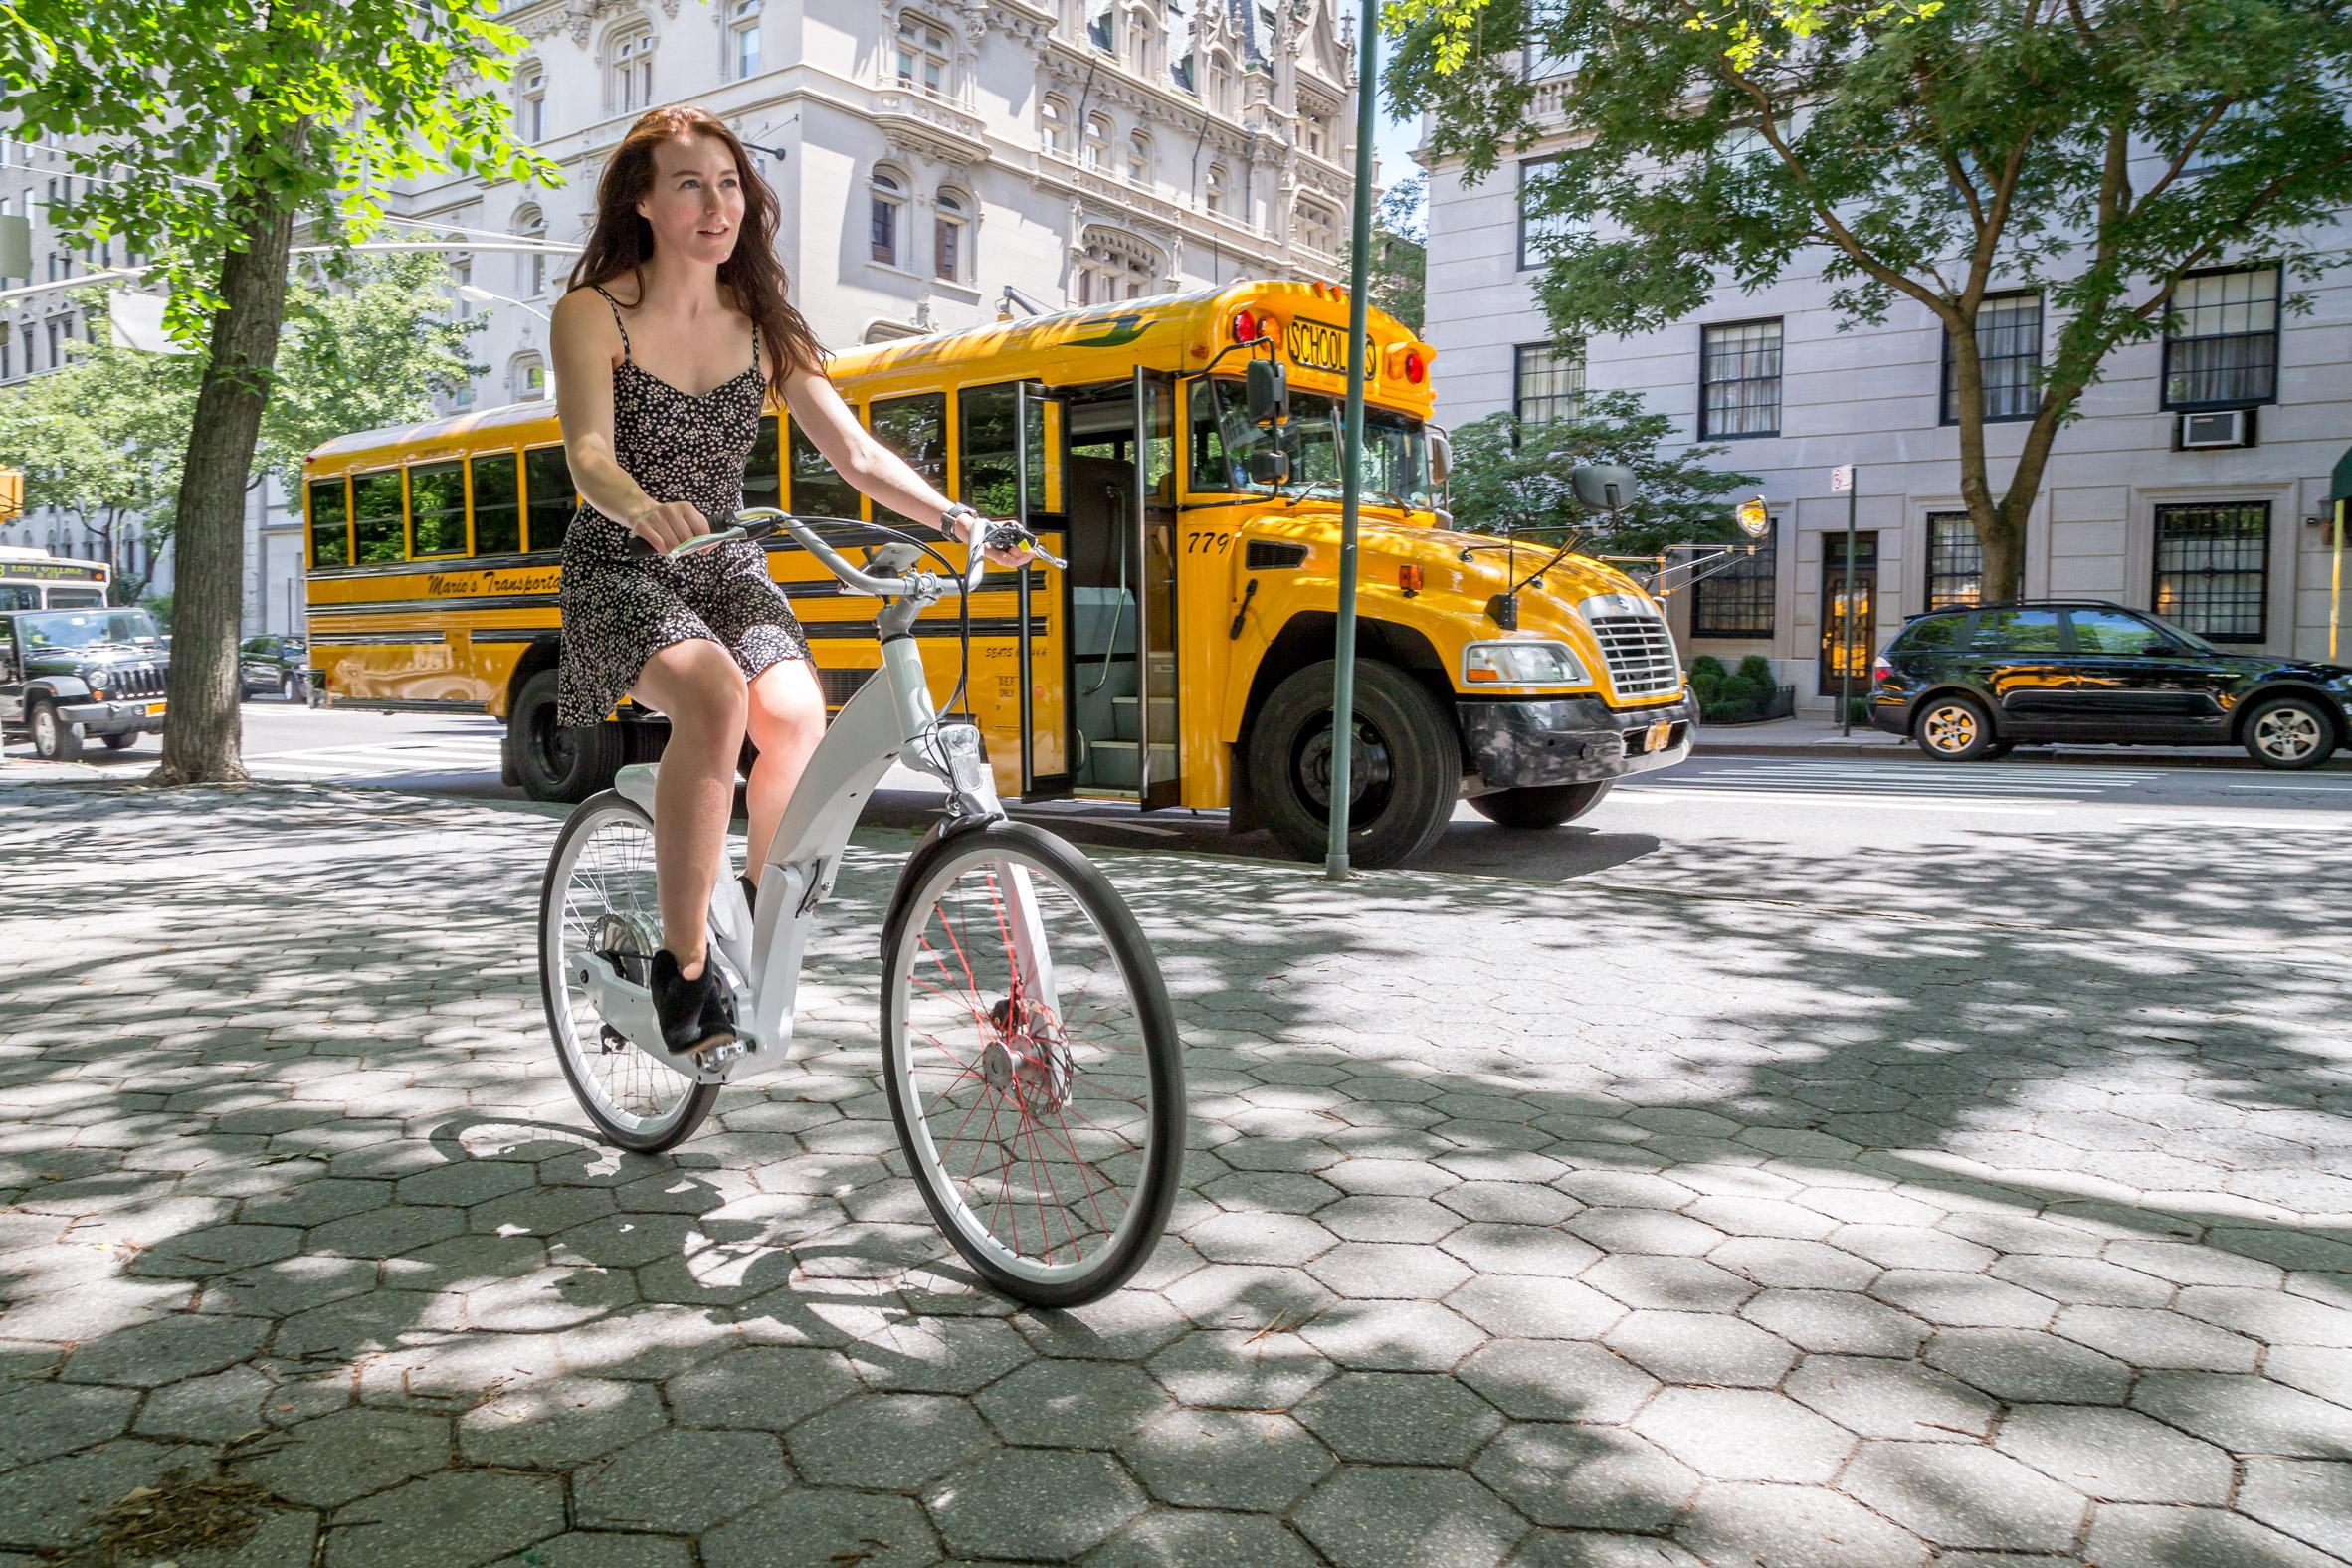 E-Bike Startups Provide A New Option for Entry-Level Transportation